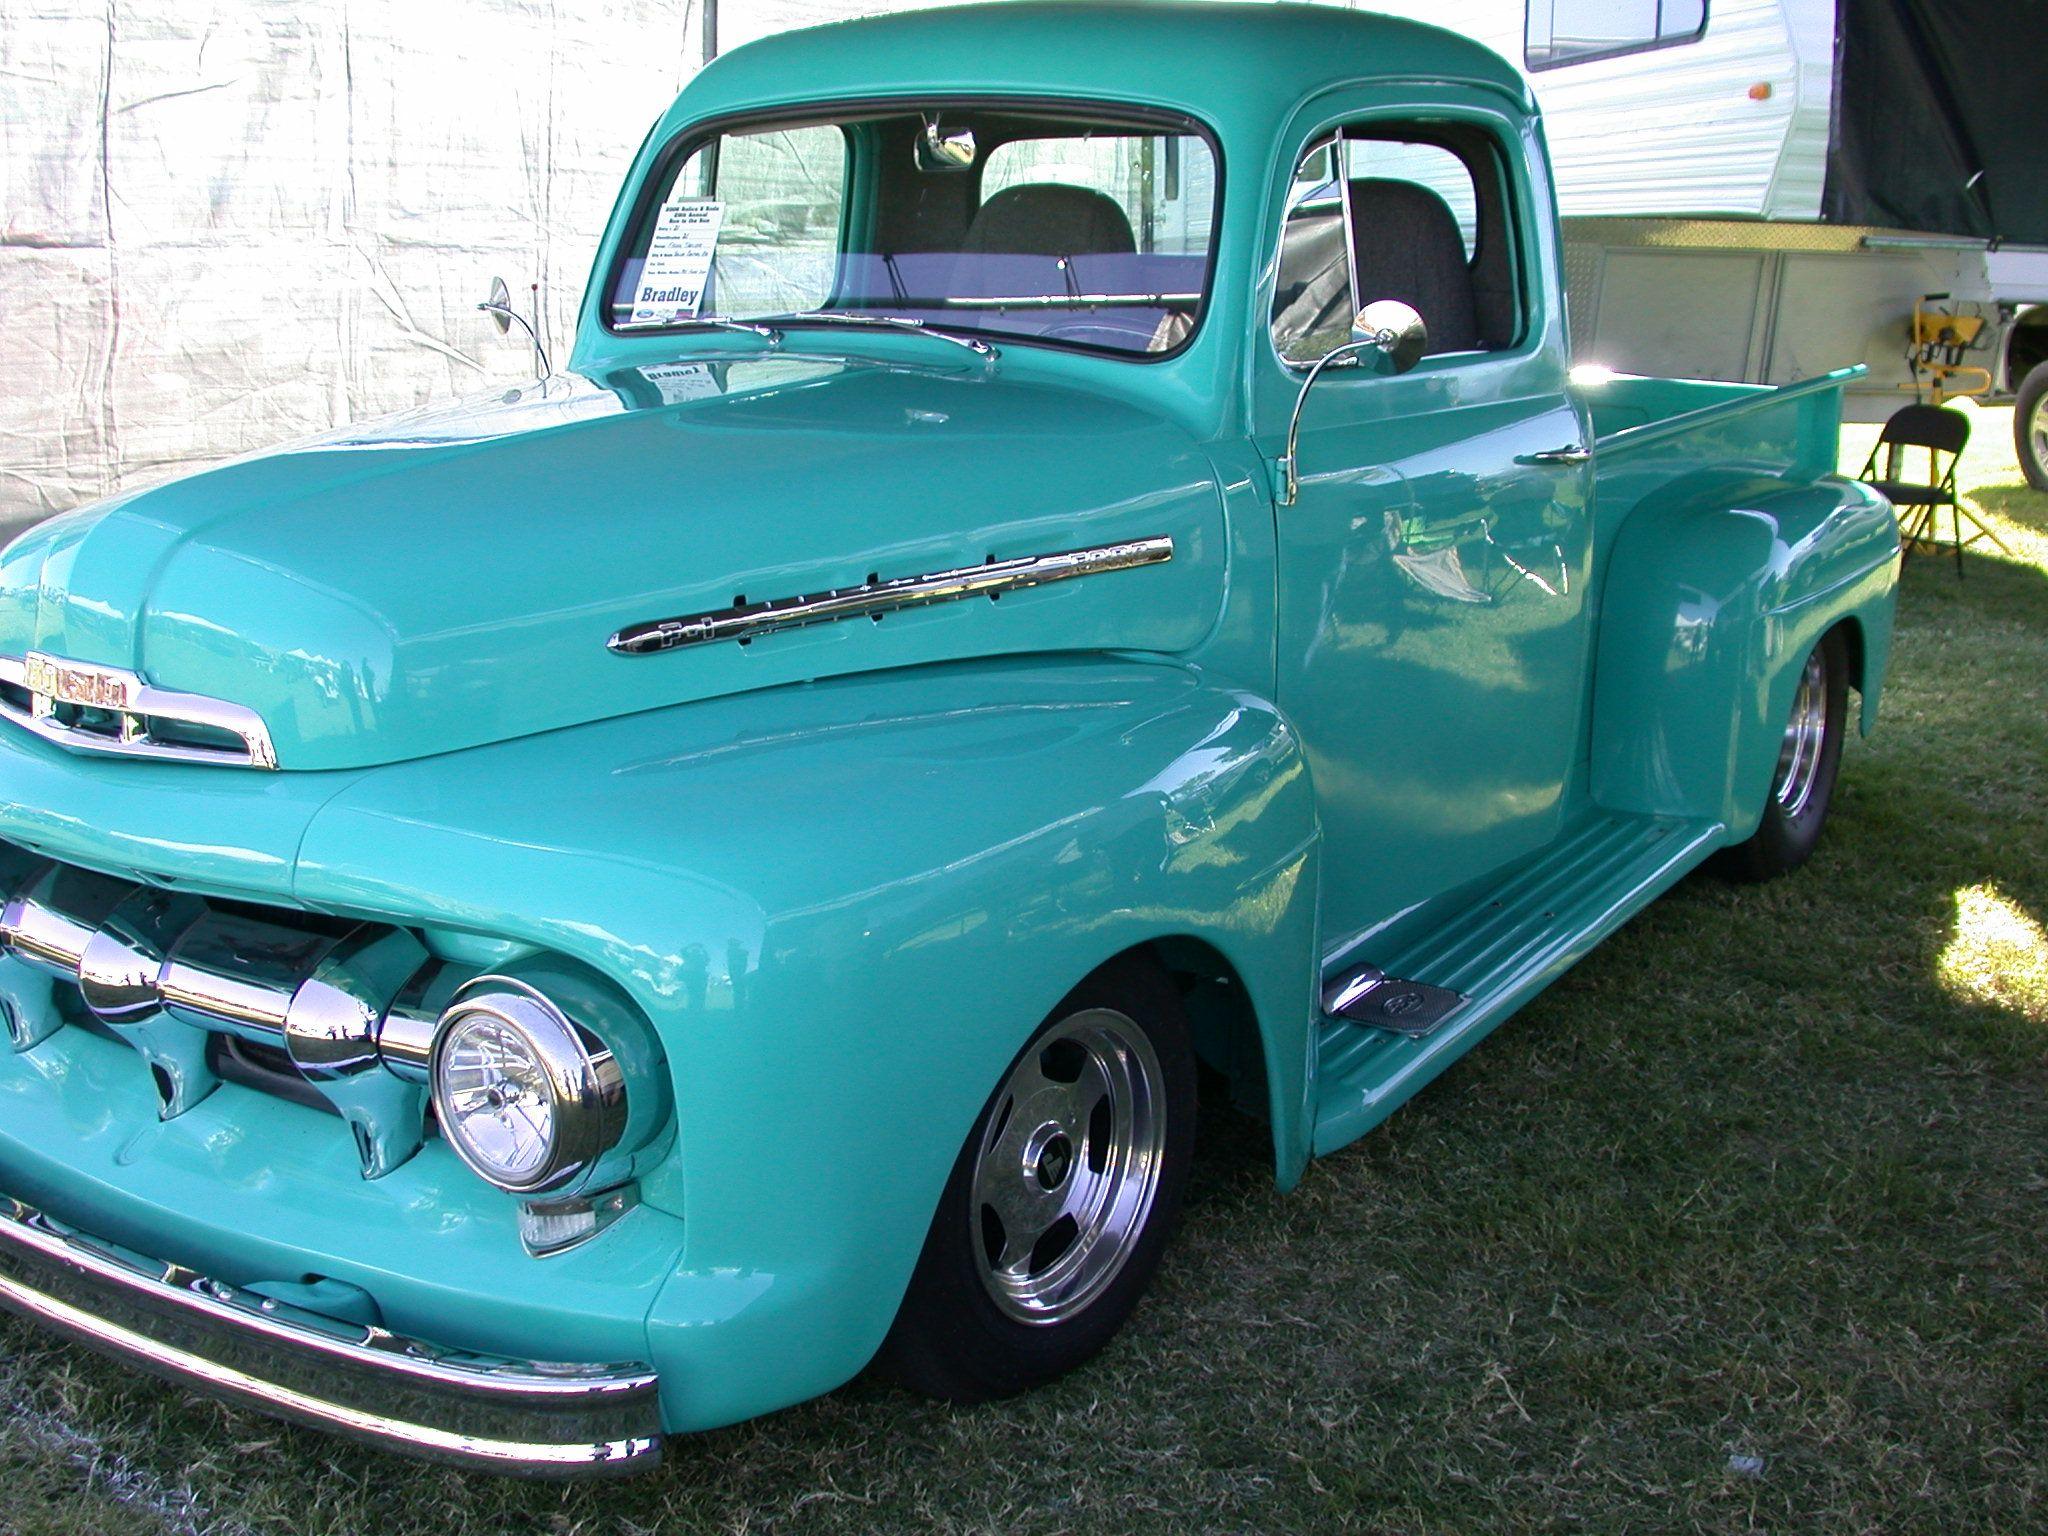 1951 Ford F100 Our 1st Classic I Think Your Right Its A Flathead V8 But Im Still Not Certai Classic Cars Trucks Ford Pickup Trucks Custom Chevy Trucks